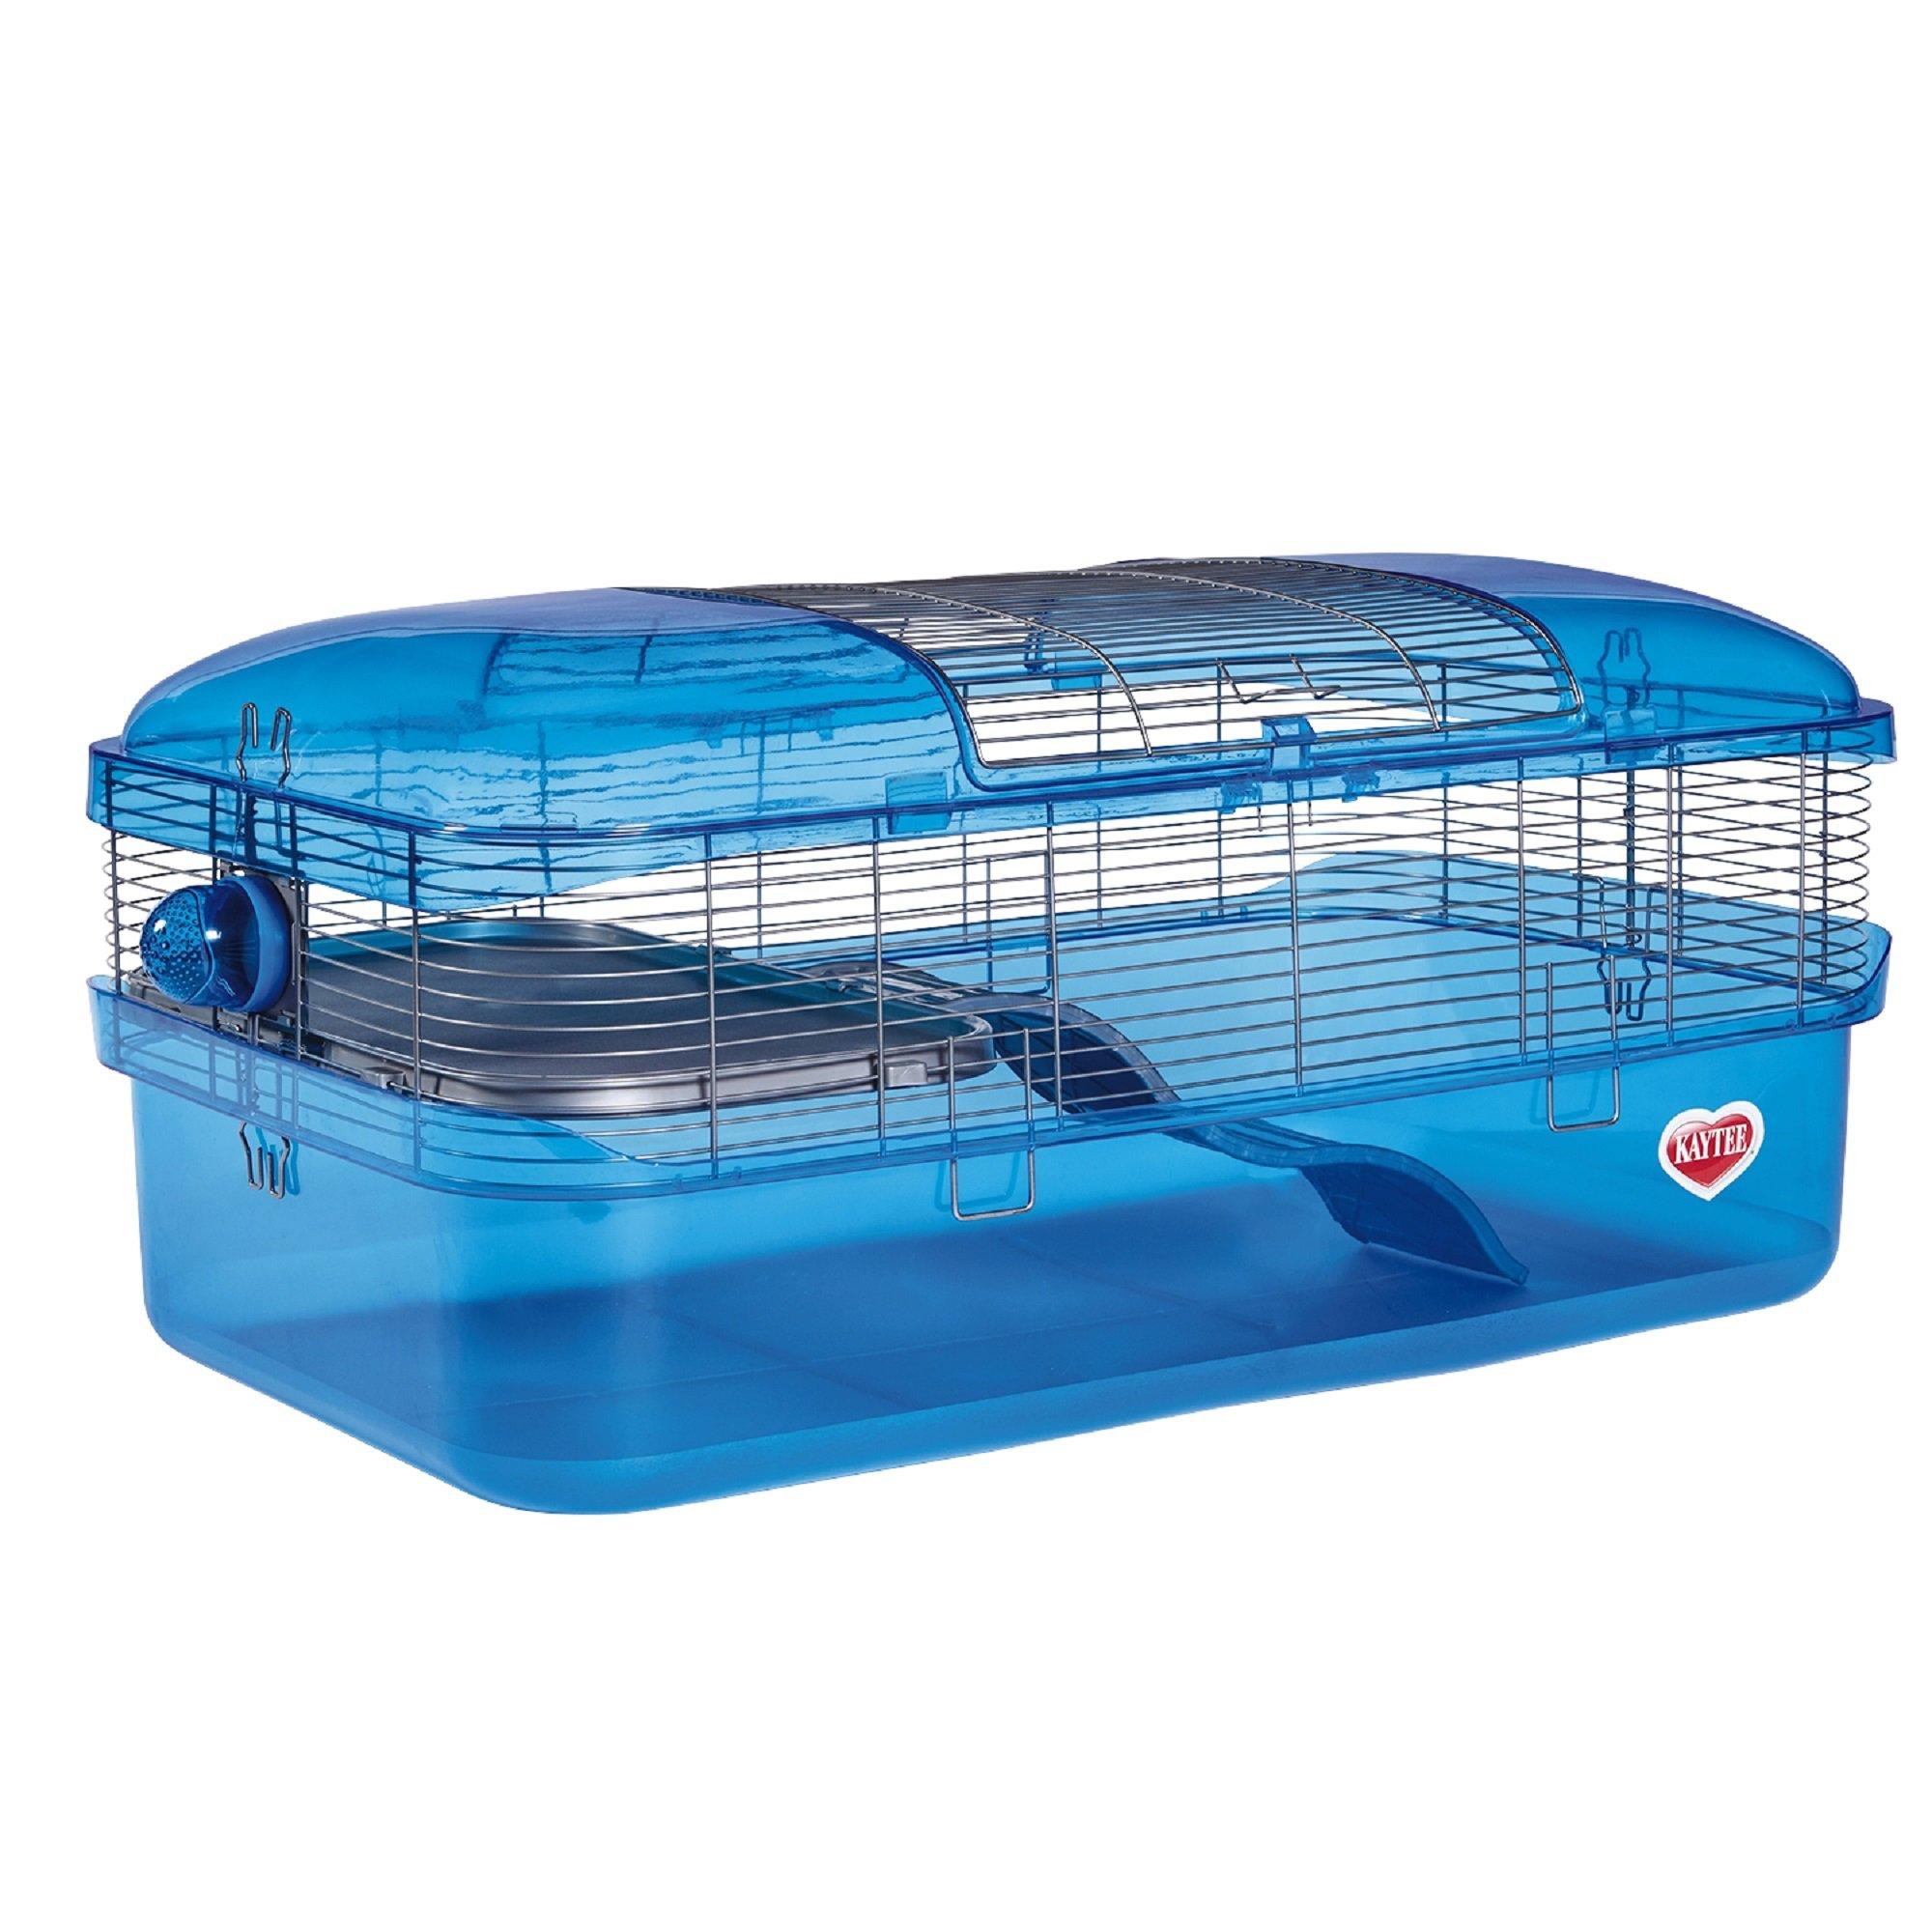 kaytee crittertrail super hamster habitat petco